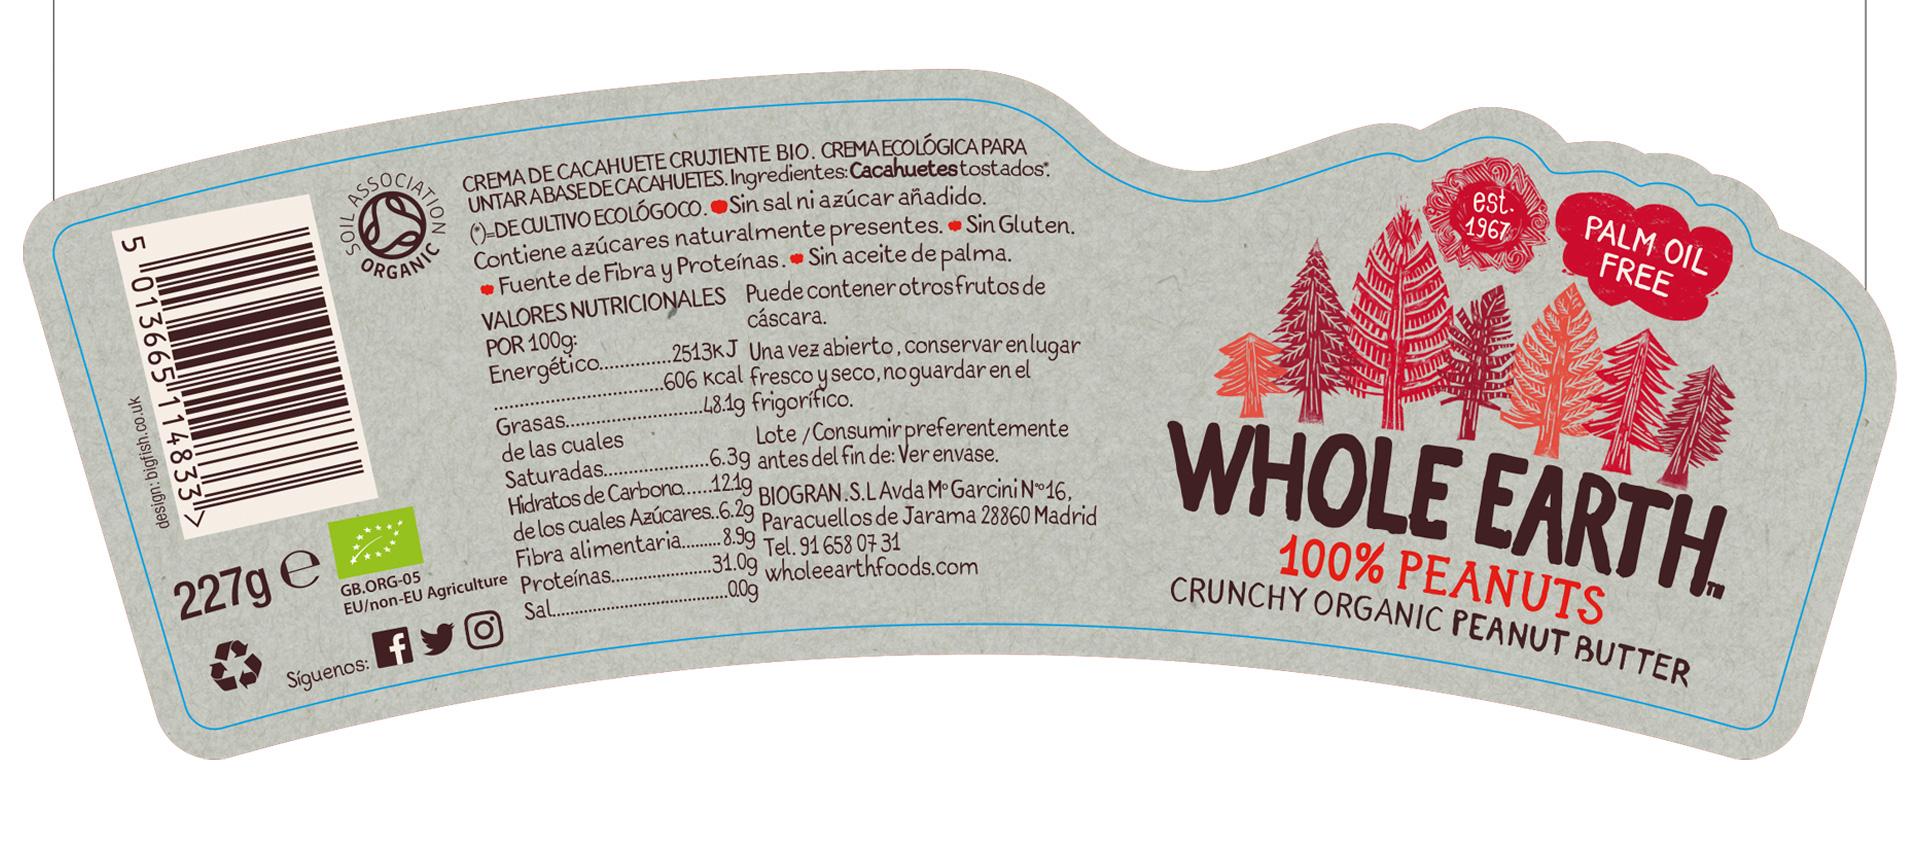 localisation-food-packaging-artwork-whole-earth-translation